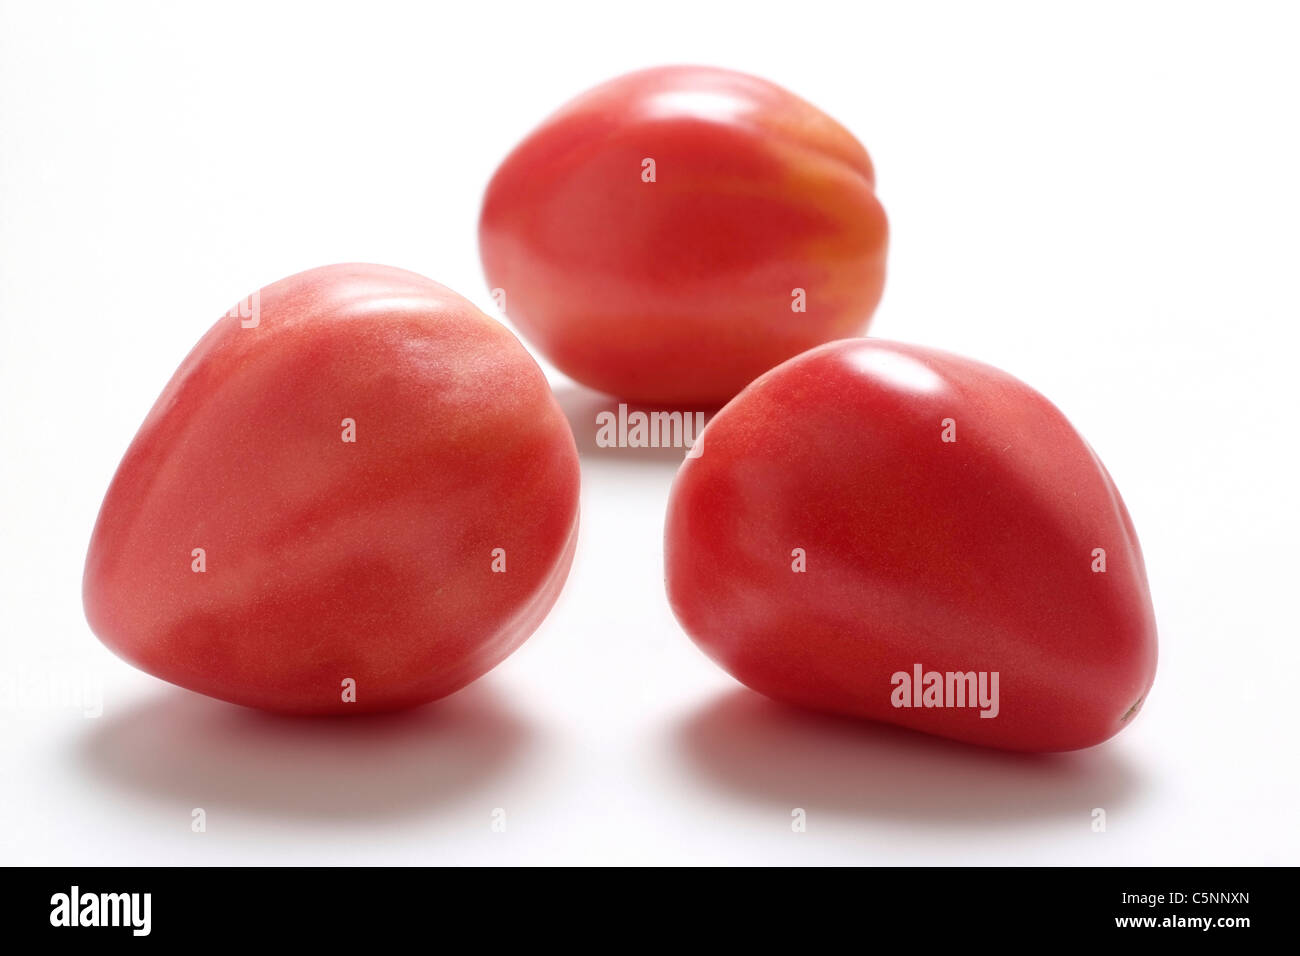 Tomato varieties: Herztomate - Stock Image